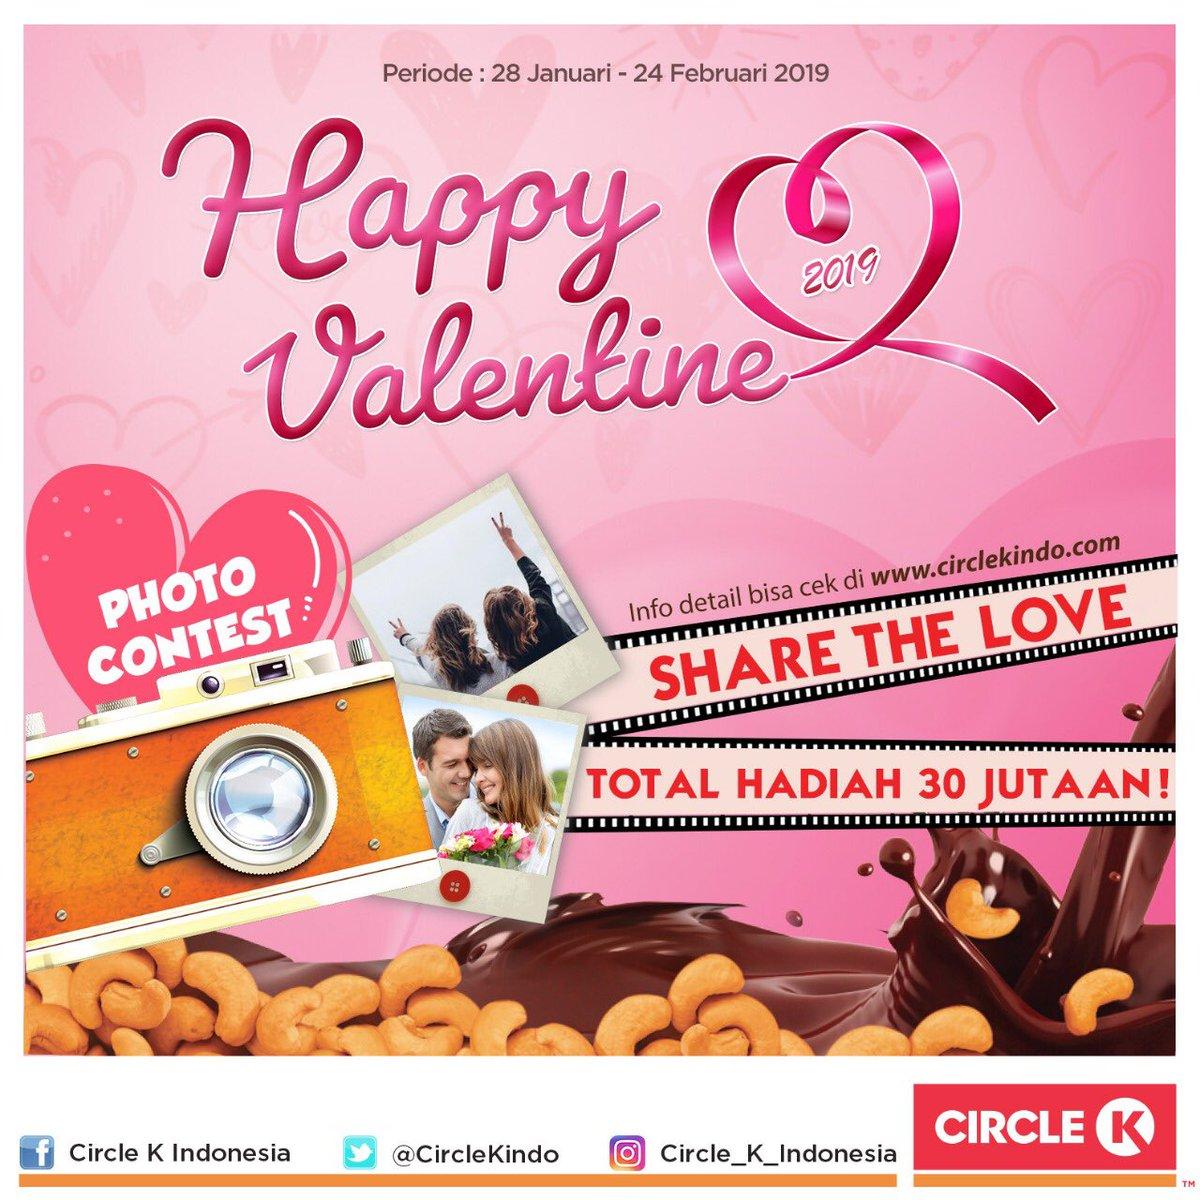 #CircleK - #Promo Photo Contest di Happy Valentine 2019 ( s.d 24 Feb 2019)